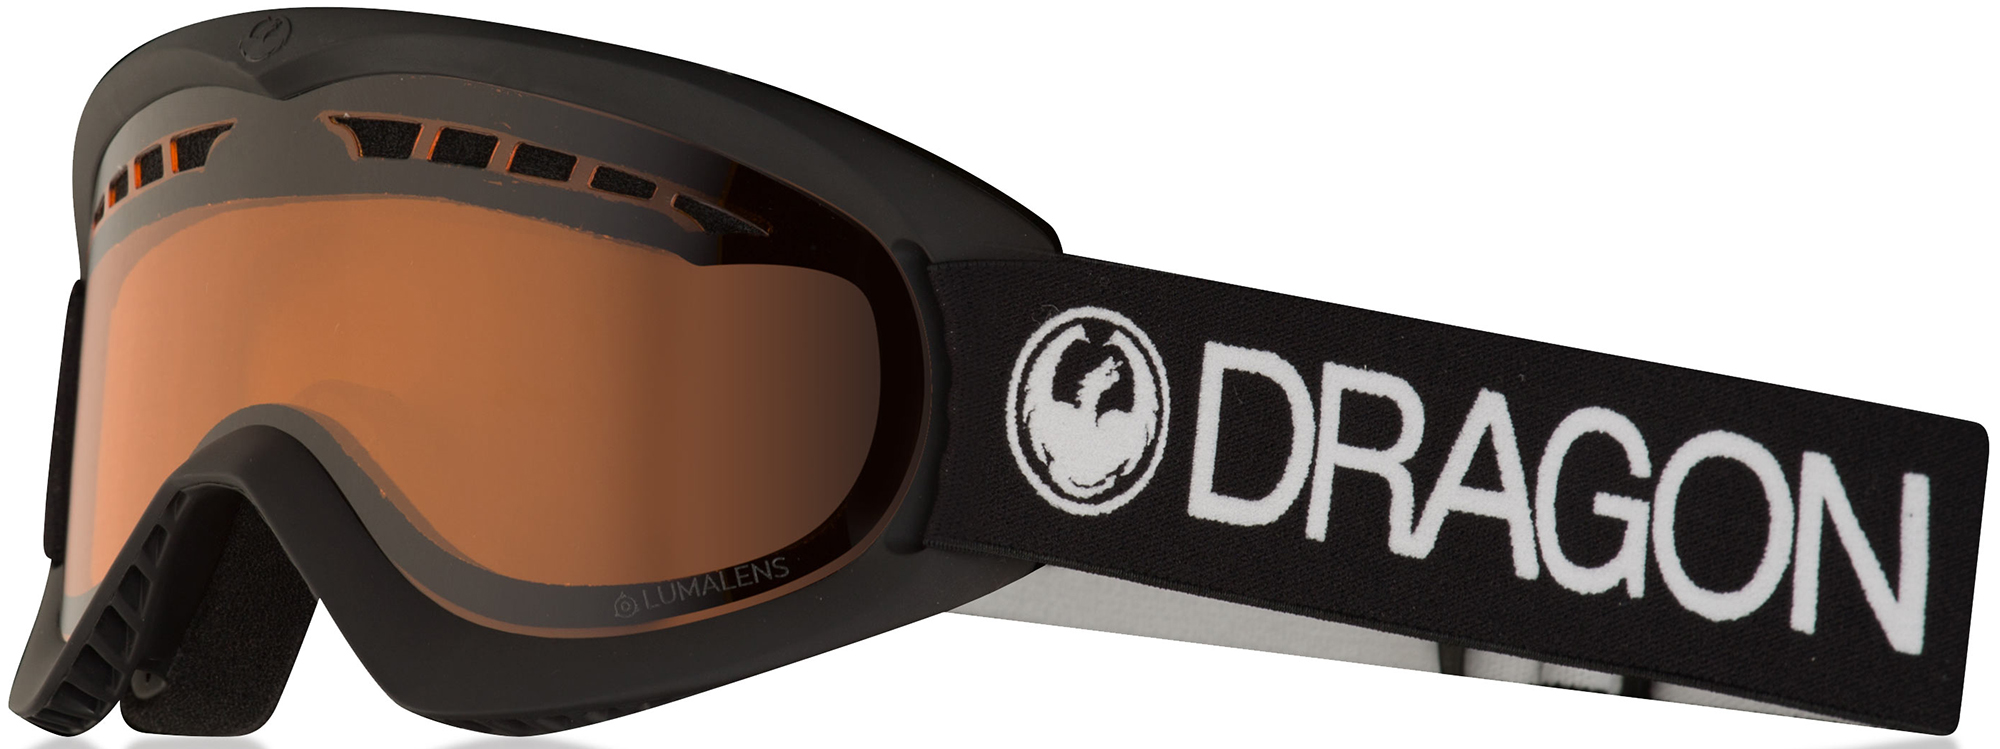 Dragon Маска Dragon Dx Black - Lumalens